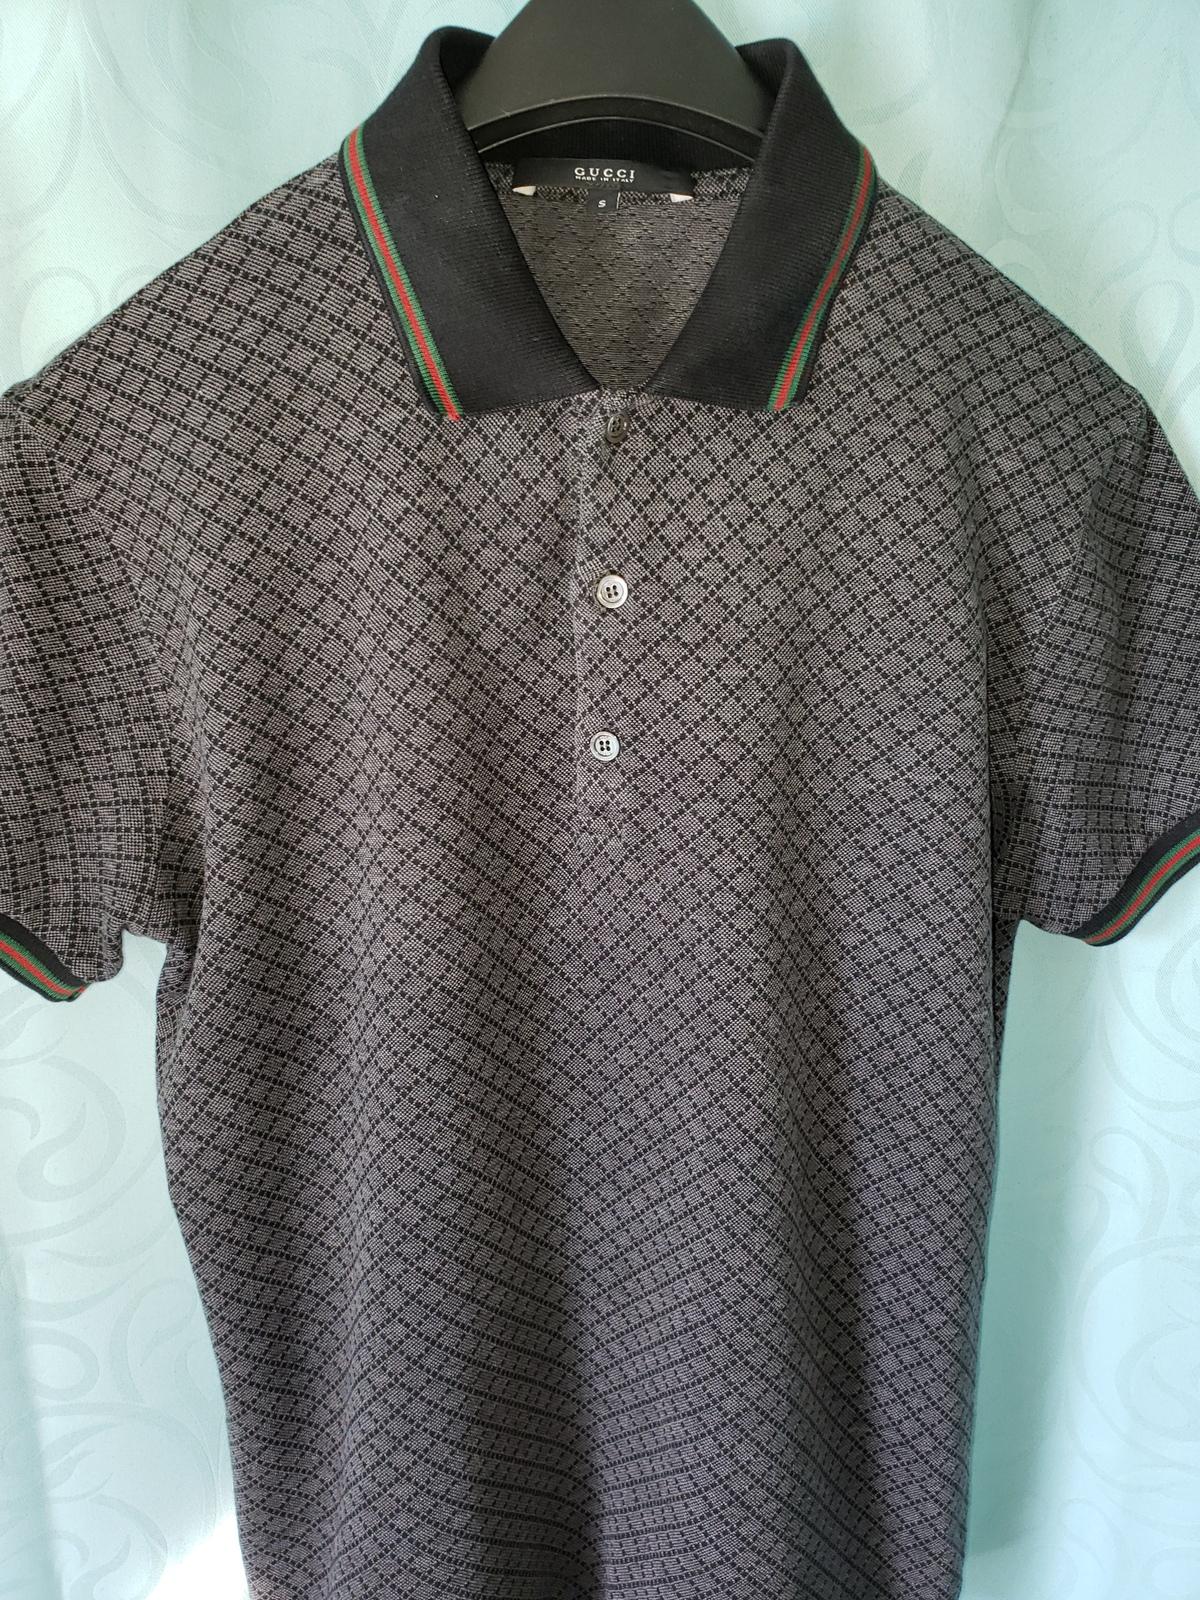 ea7abbfdd6b Gucci Polo Shirt  42 customer reviews and 4 listings